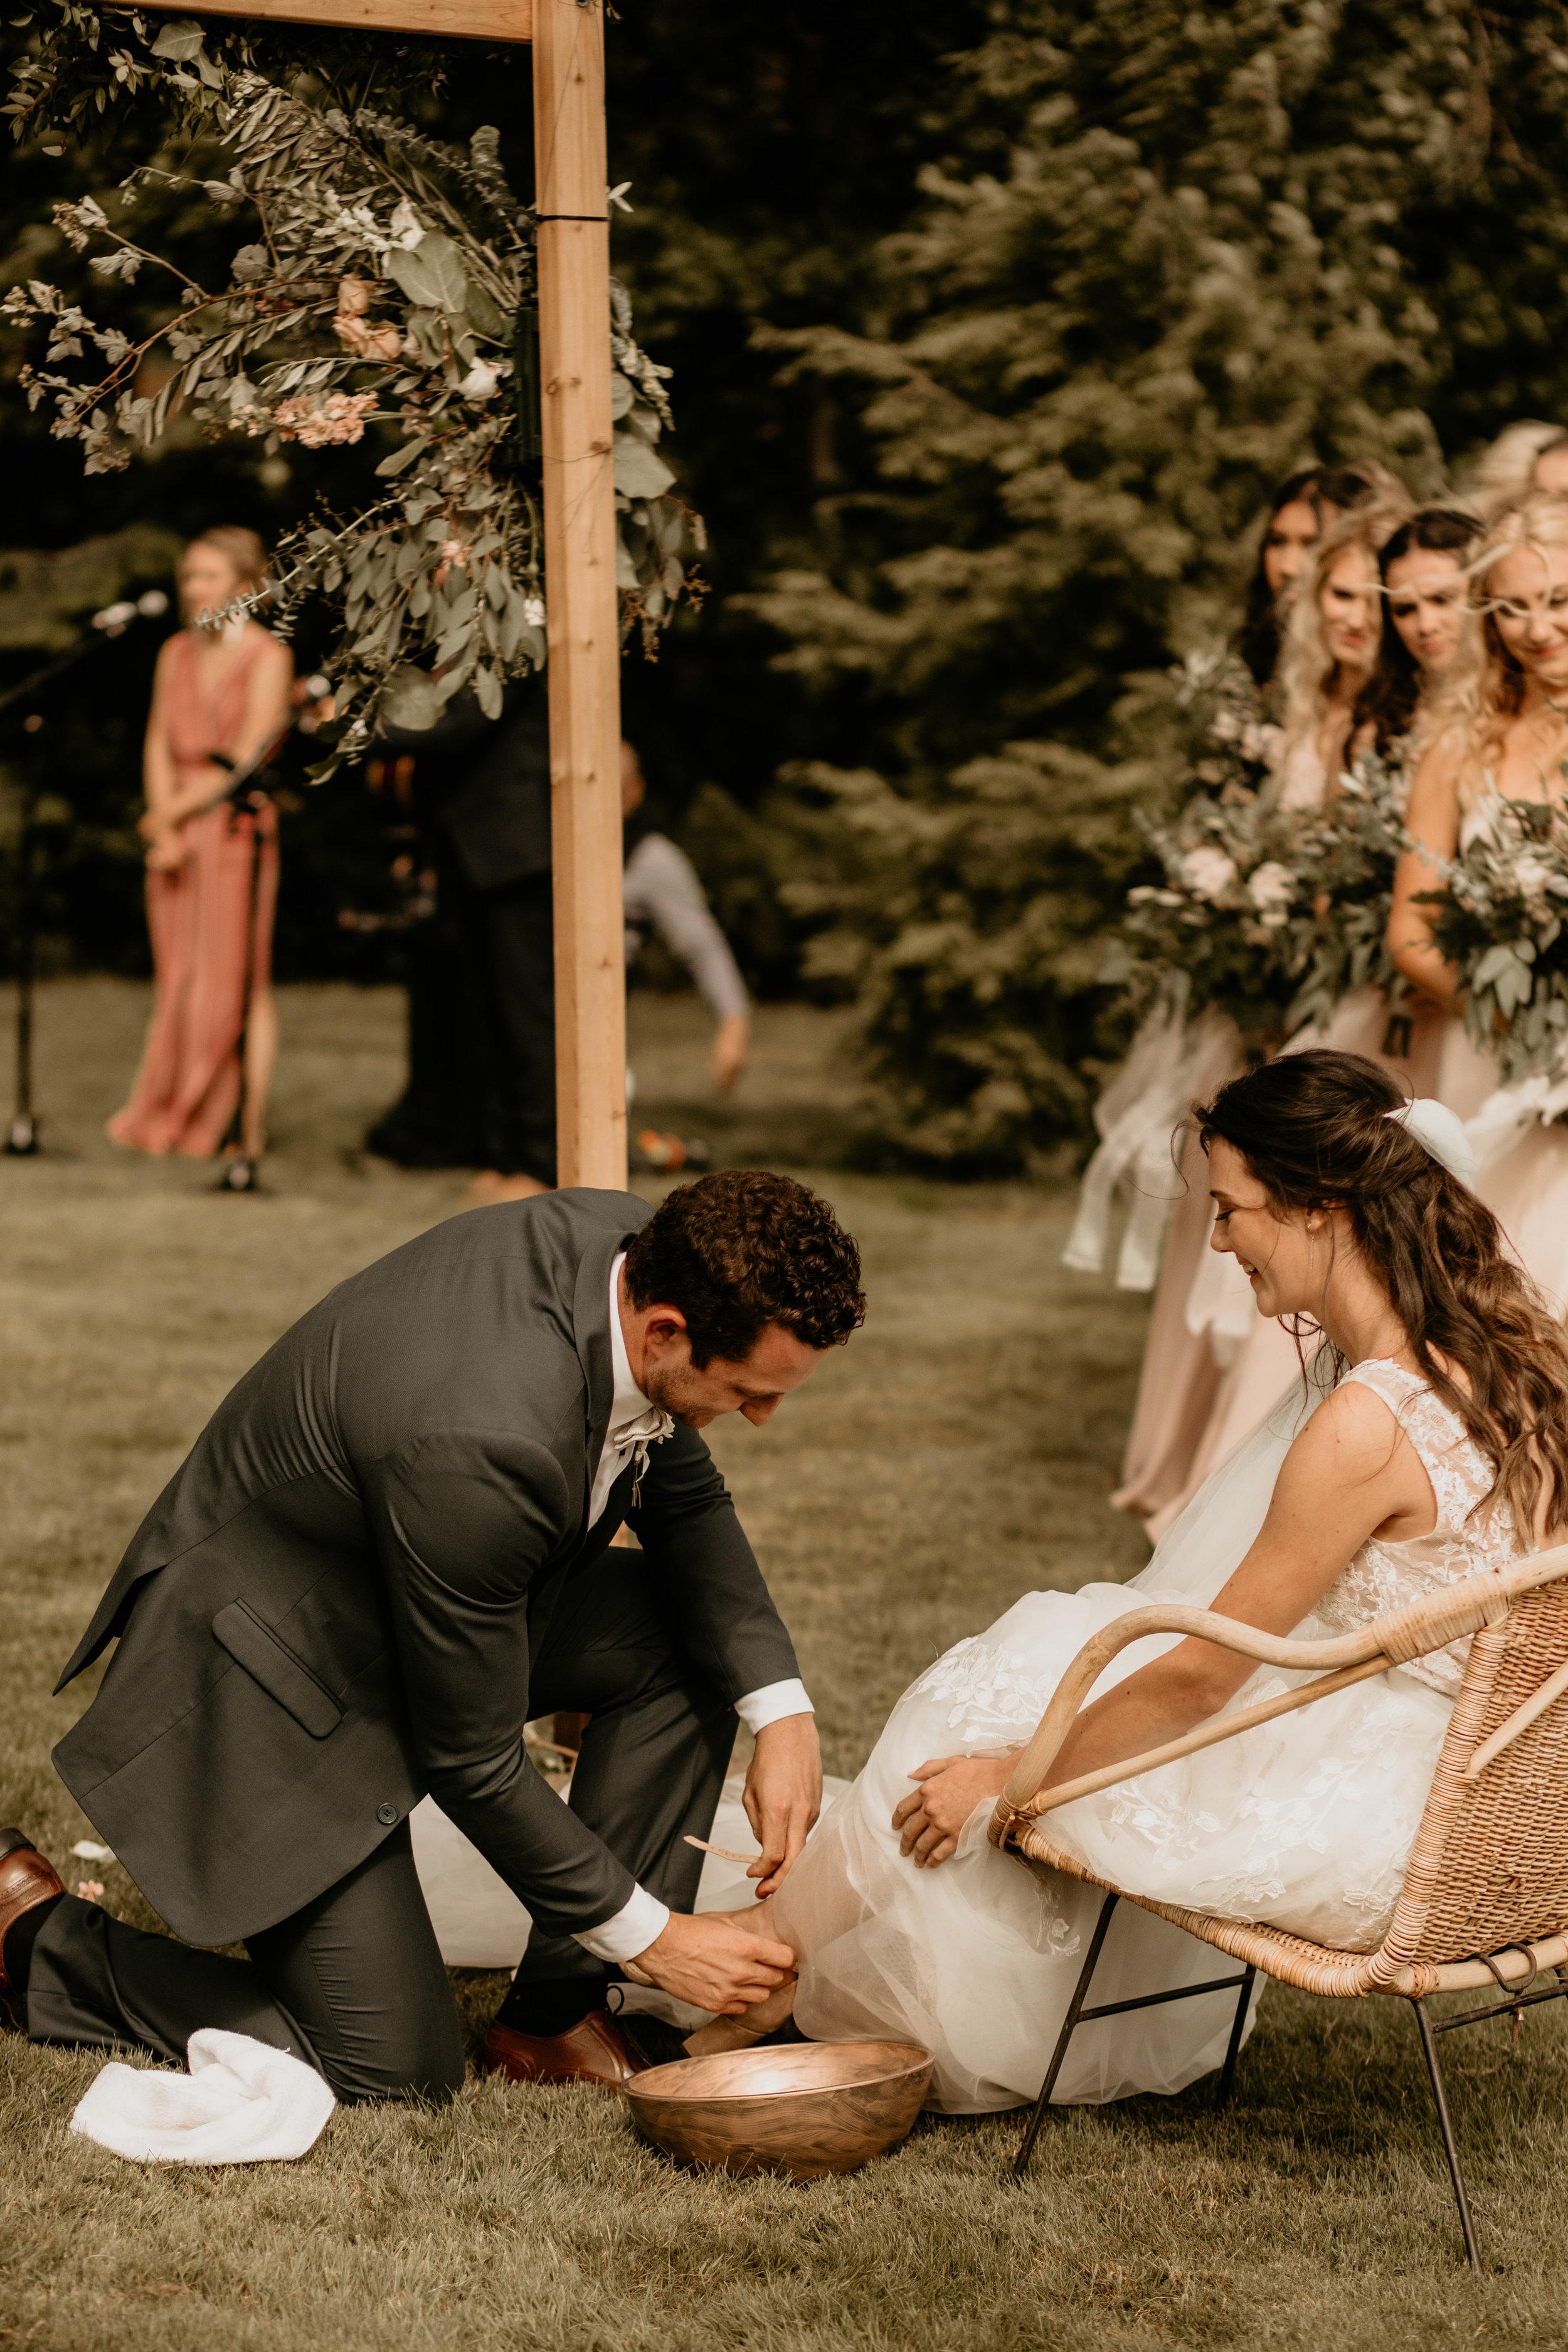 Hotel Blackwell - coeur'd'alene elopement - coeur'd'alene wedding photographer - coeur'd'alene wedding photos - coeur'd'alene Tubbs hill hike - coeur'd'alene Tubbs hill wedding - coeur'd'alene elopement photographer - coeur'd'alene Idaho - Idaho elopement - Idaho wedding photographer - coeur'd'alene hotel Blackwell